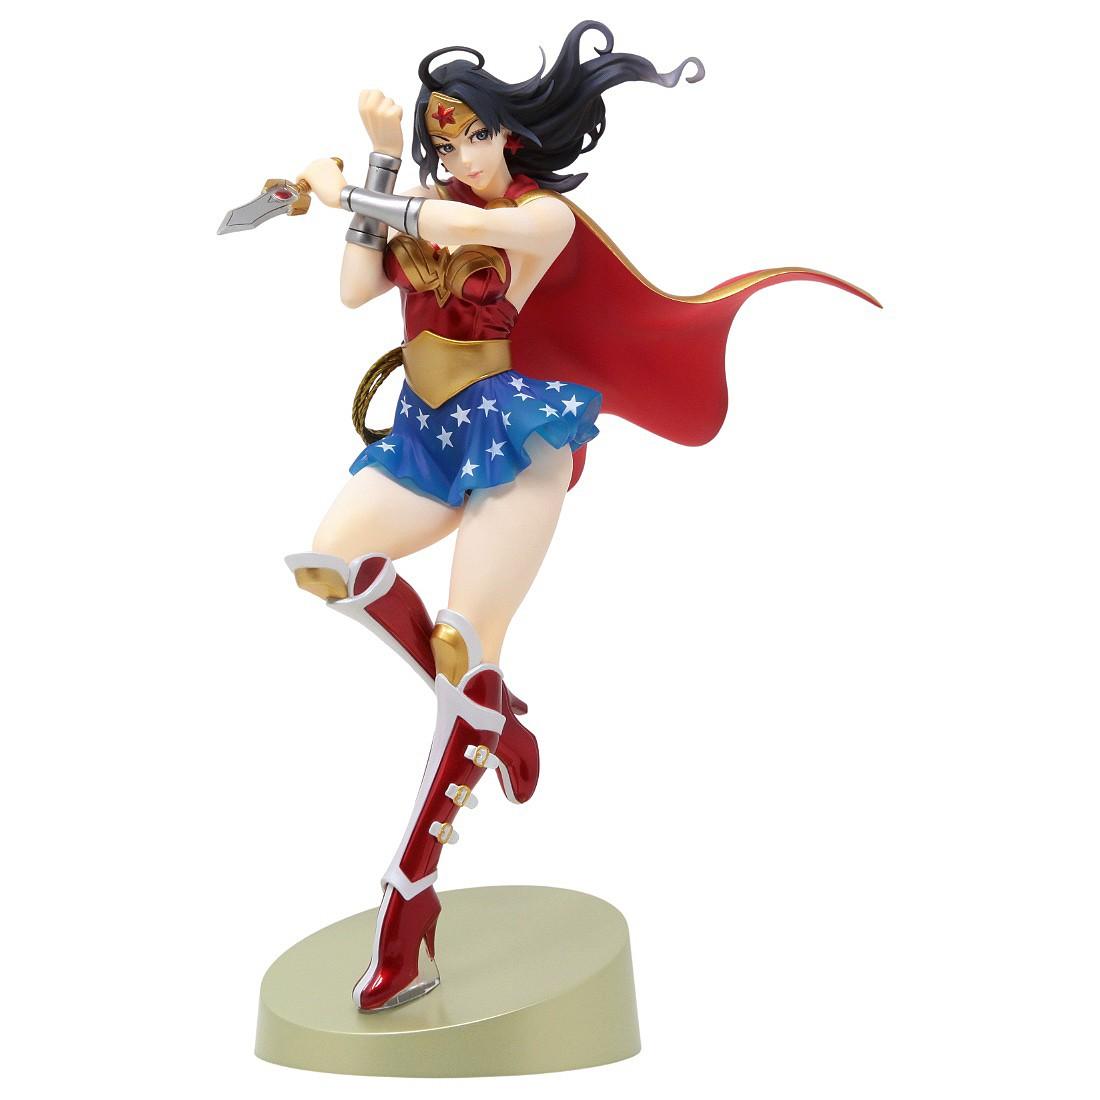 Kotobukiya DC Comics Armored Wonder Woman 2nd Edition Bishoujo Statue (red)